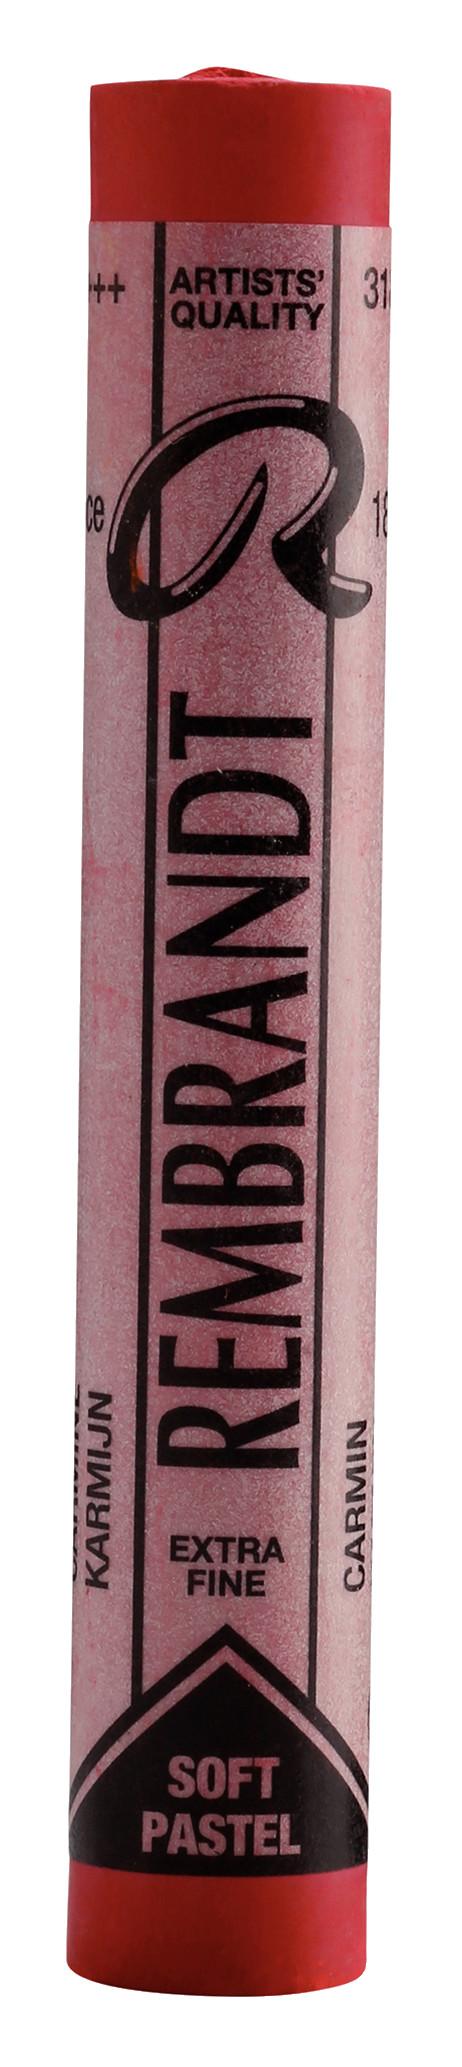 Rembrandt Soft Pastel Round Full Stick Carmine(5) (318.5)